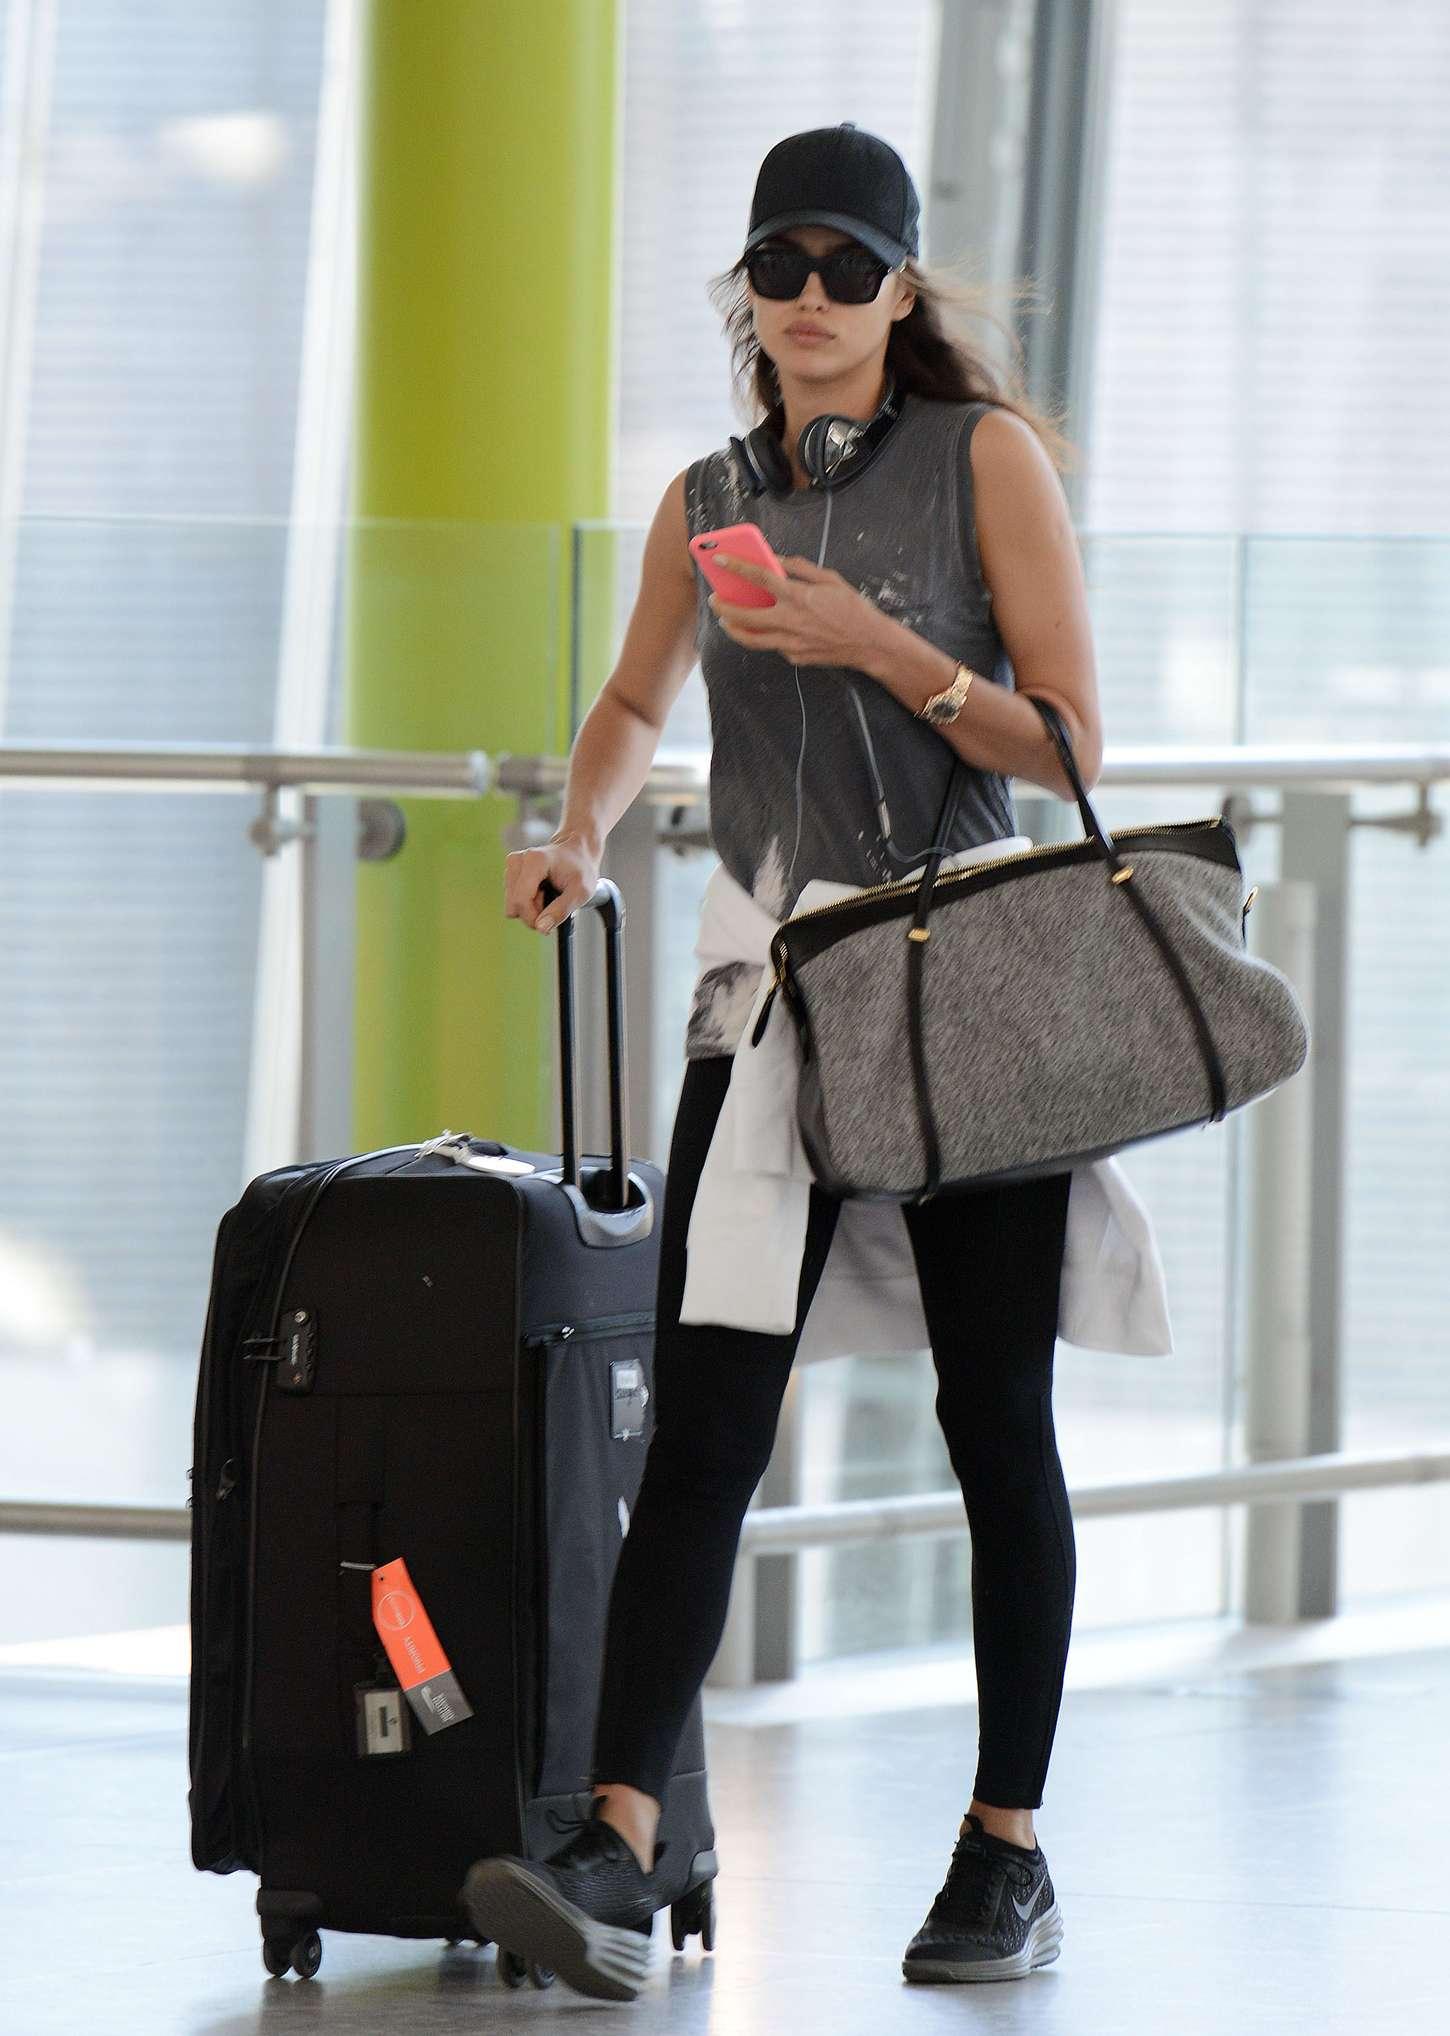 Irina Shayk 2015 : Irina Shayk in Leggings at Heathrow airport -11